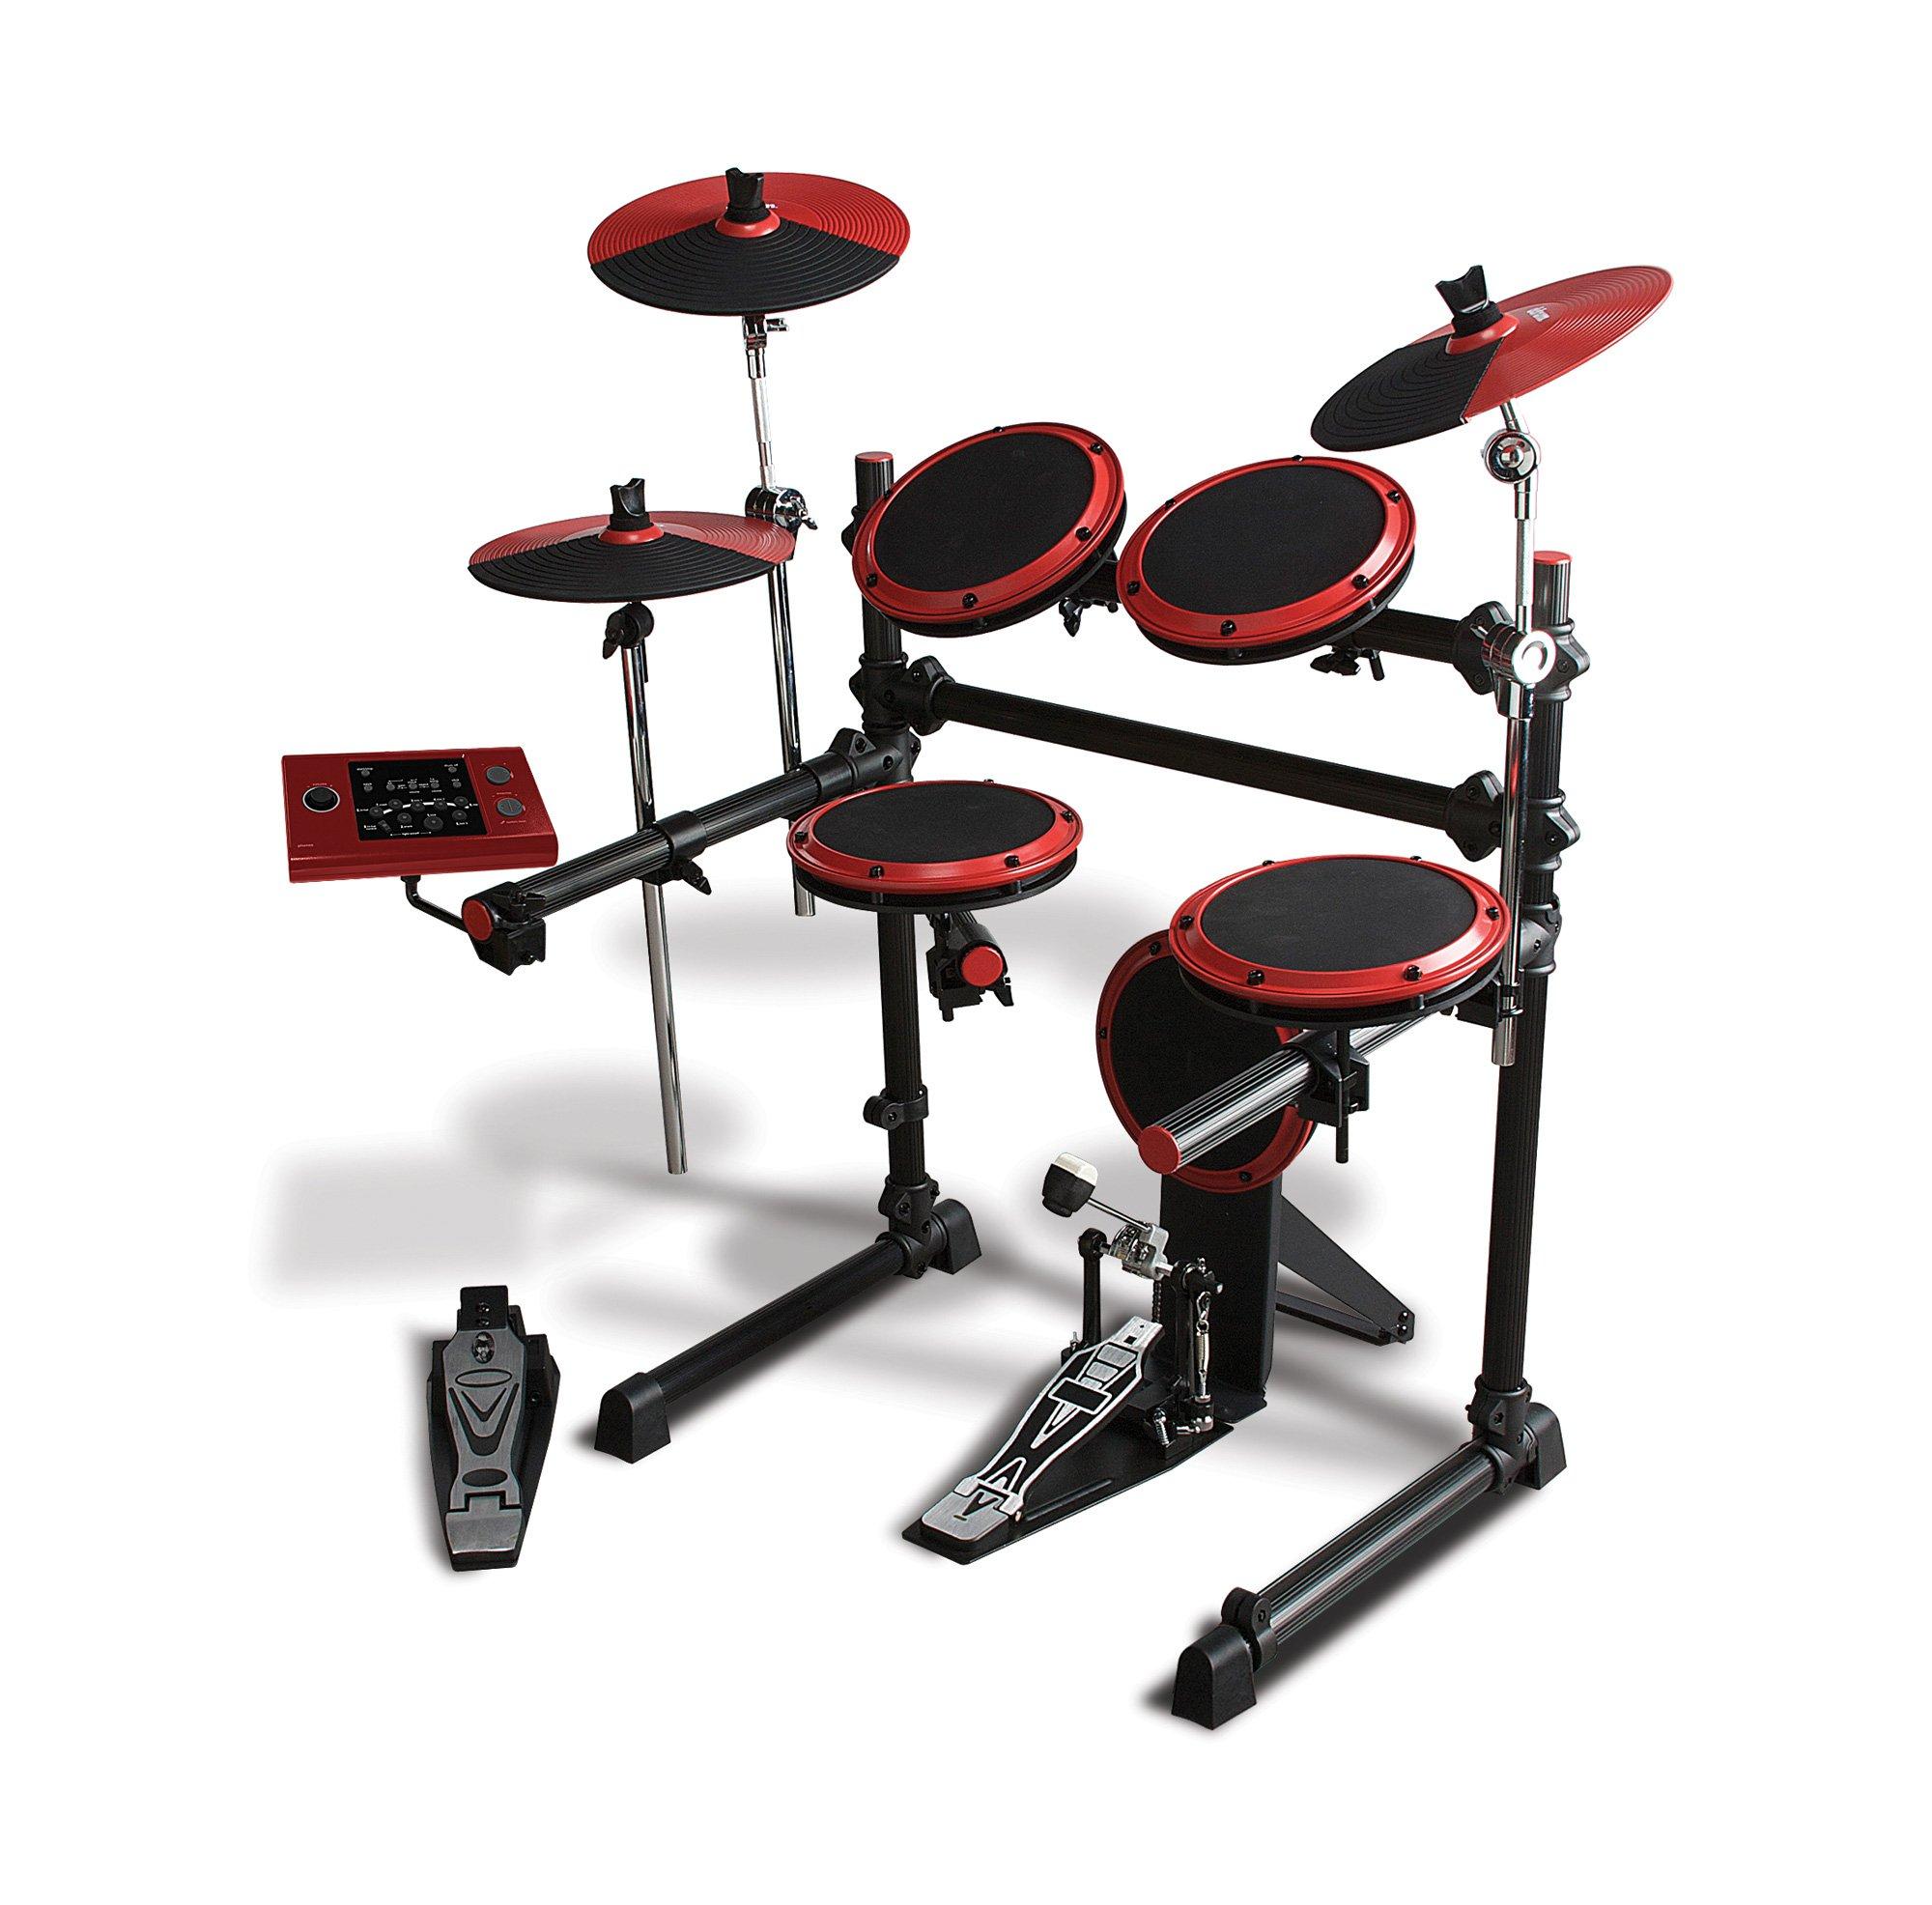 ddrum DD1 Digital Drum Set 100 Series